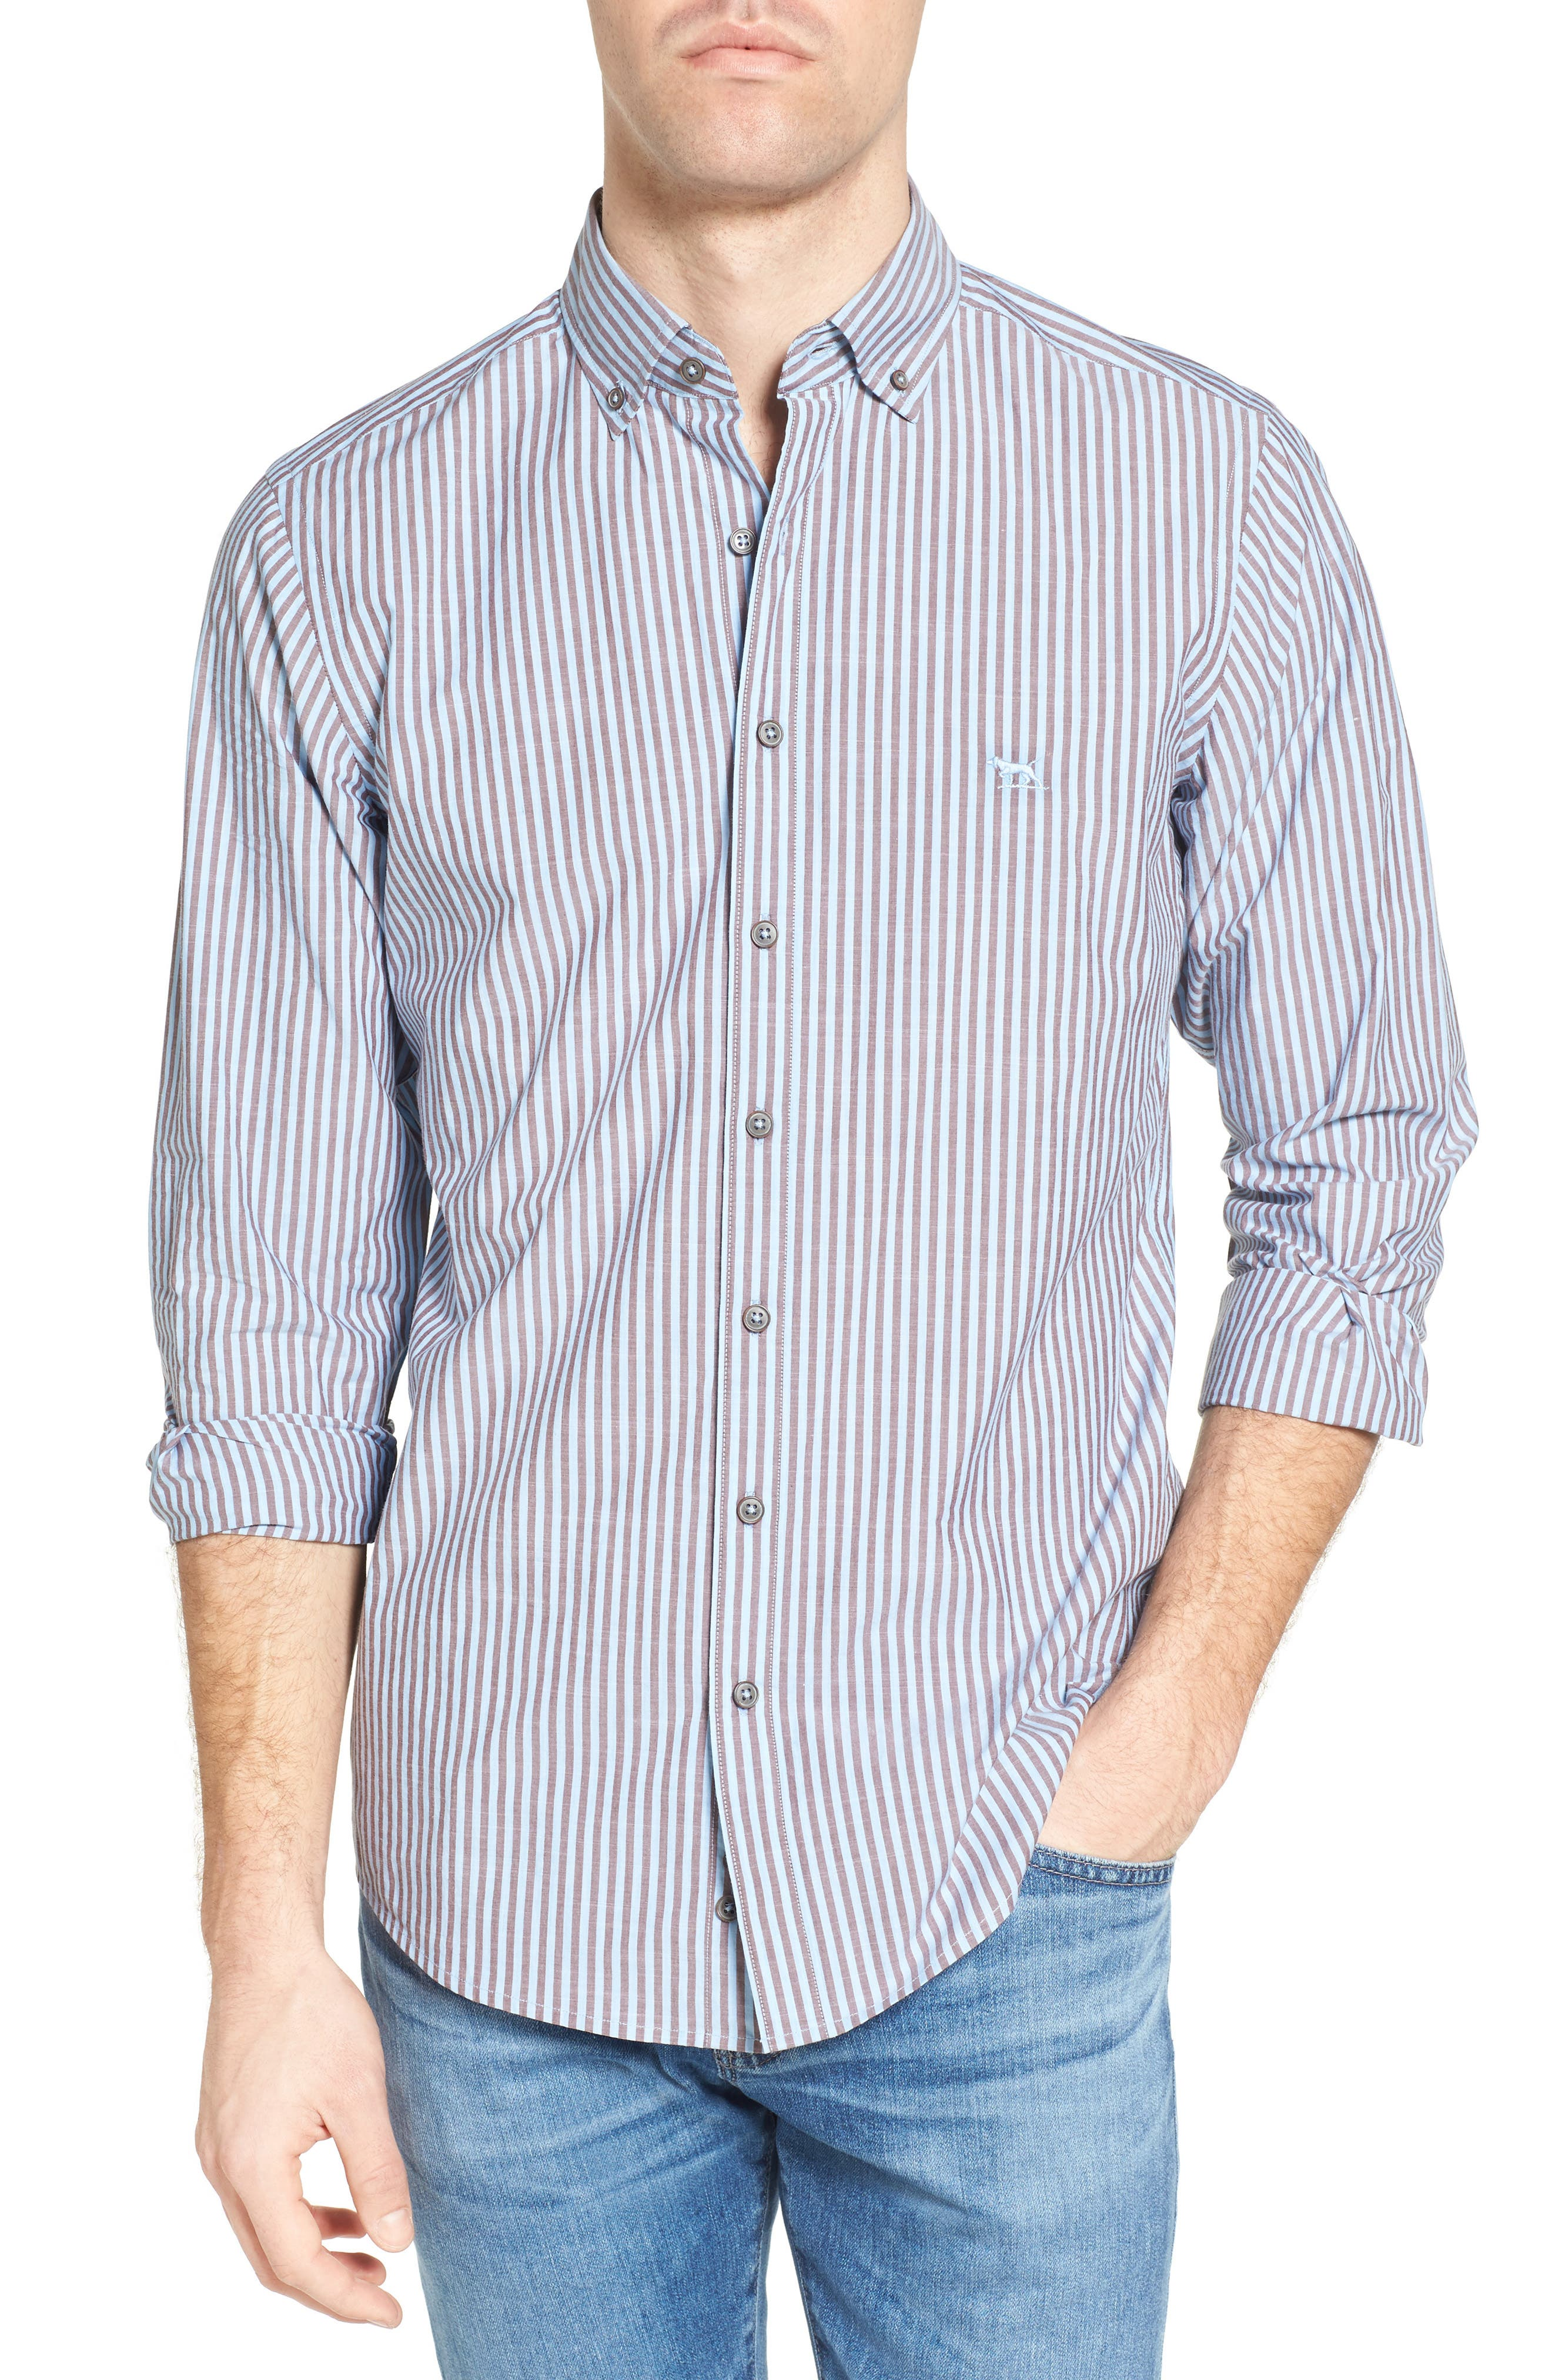 Fitzroy Stripe Sport Shirt,                             Main thumbnail 1, color,                             456